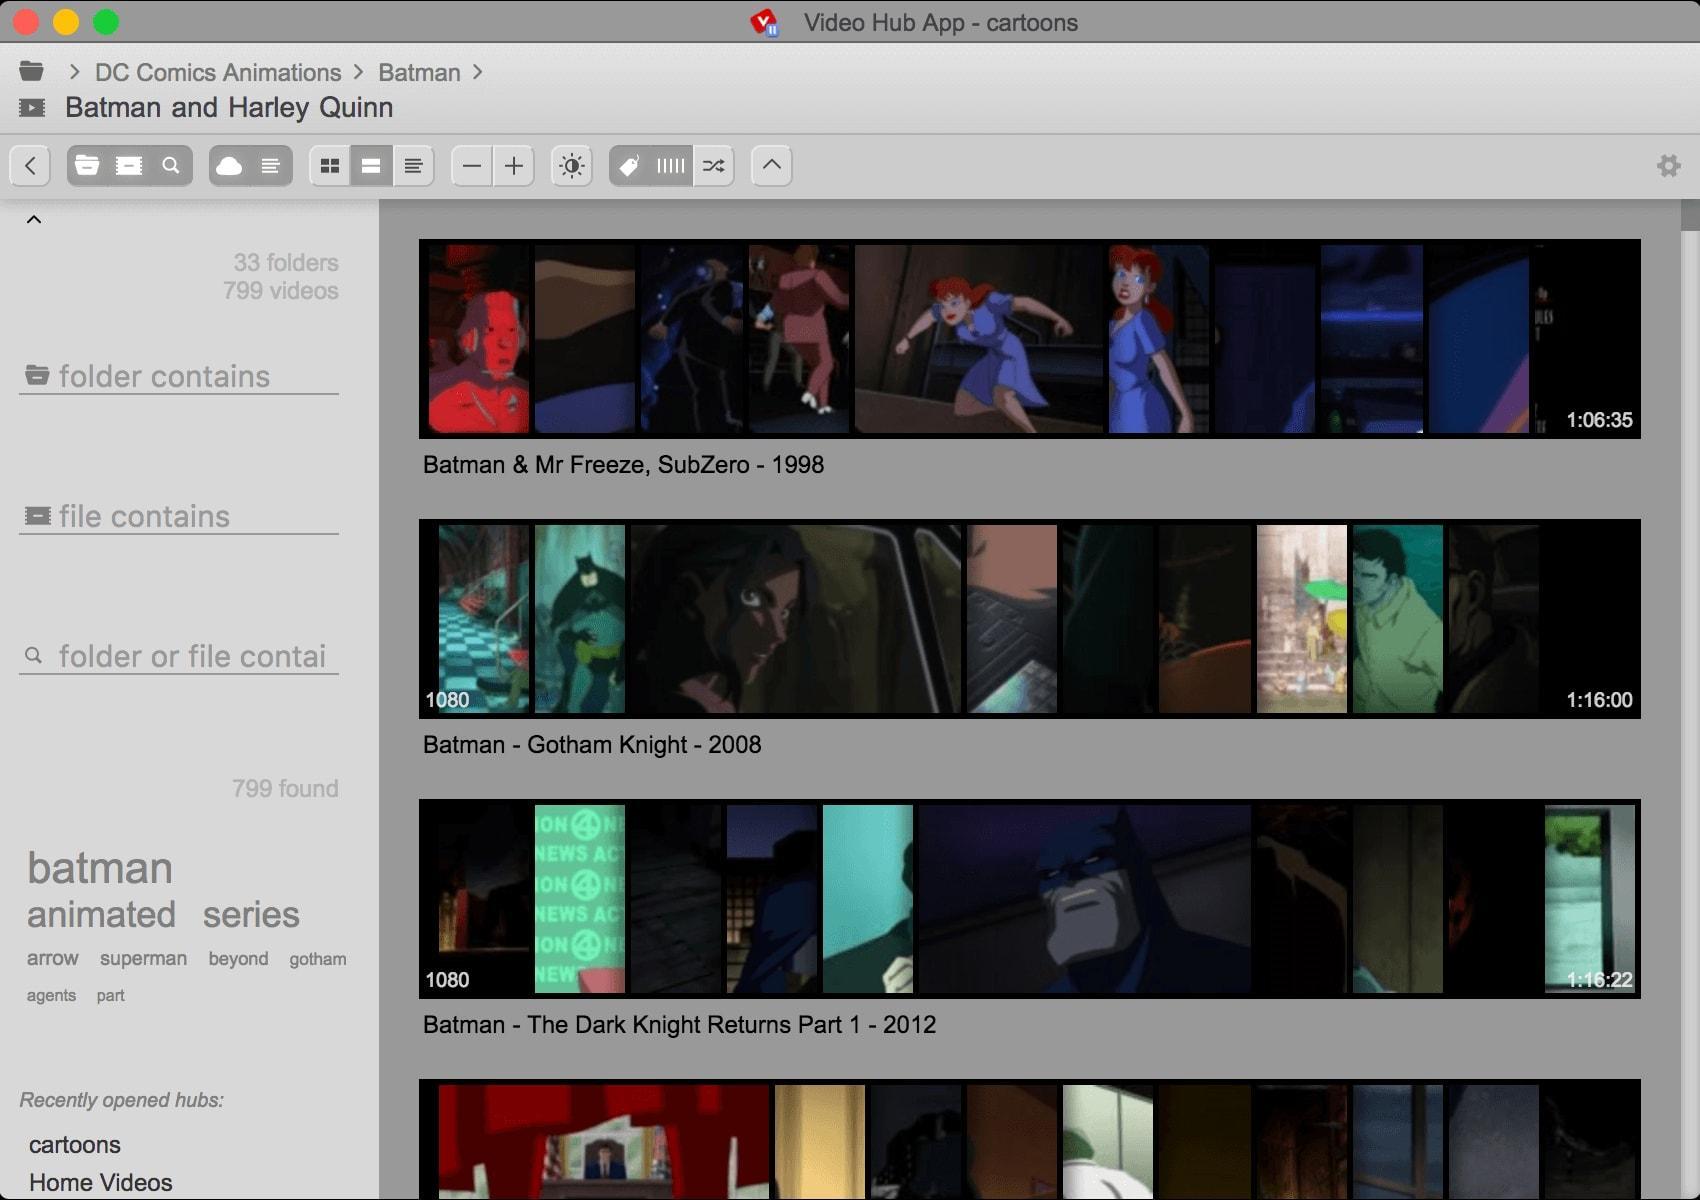 Video Hub App